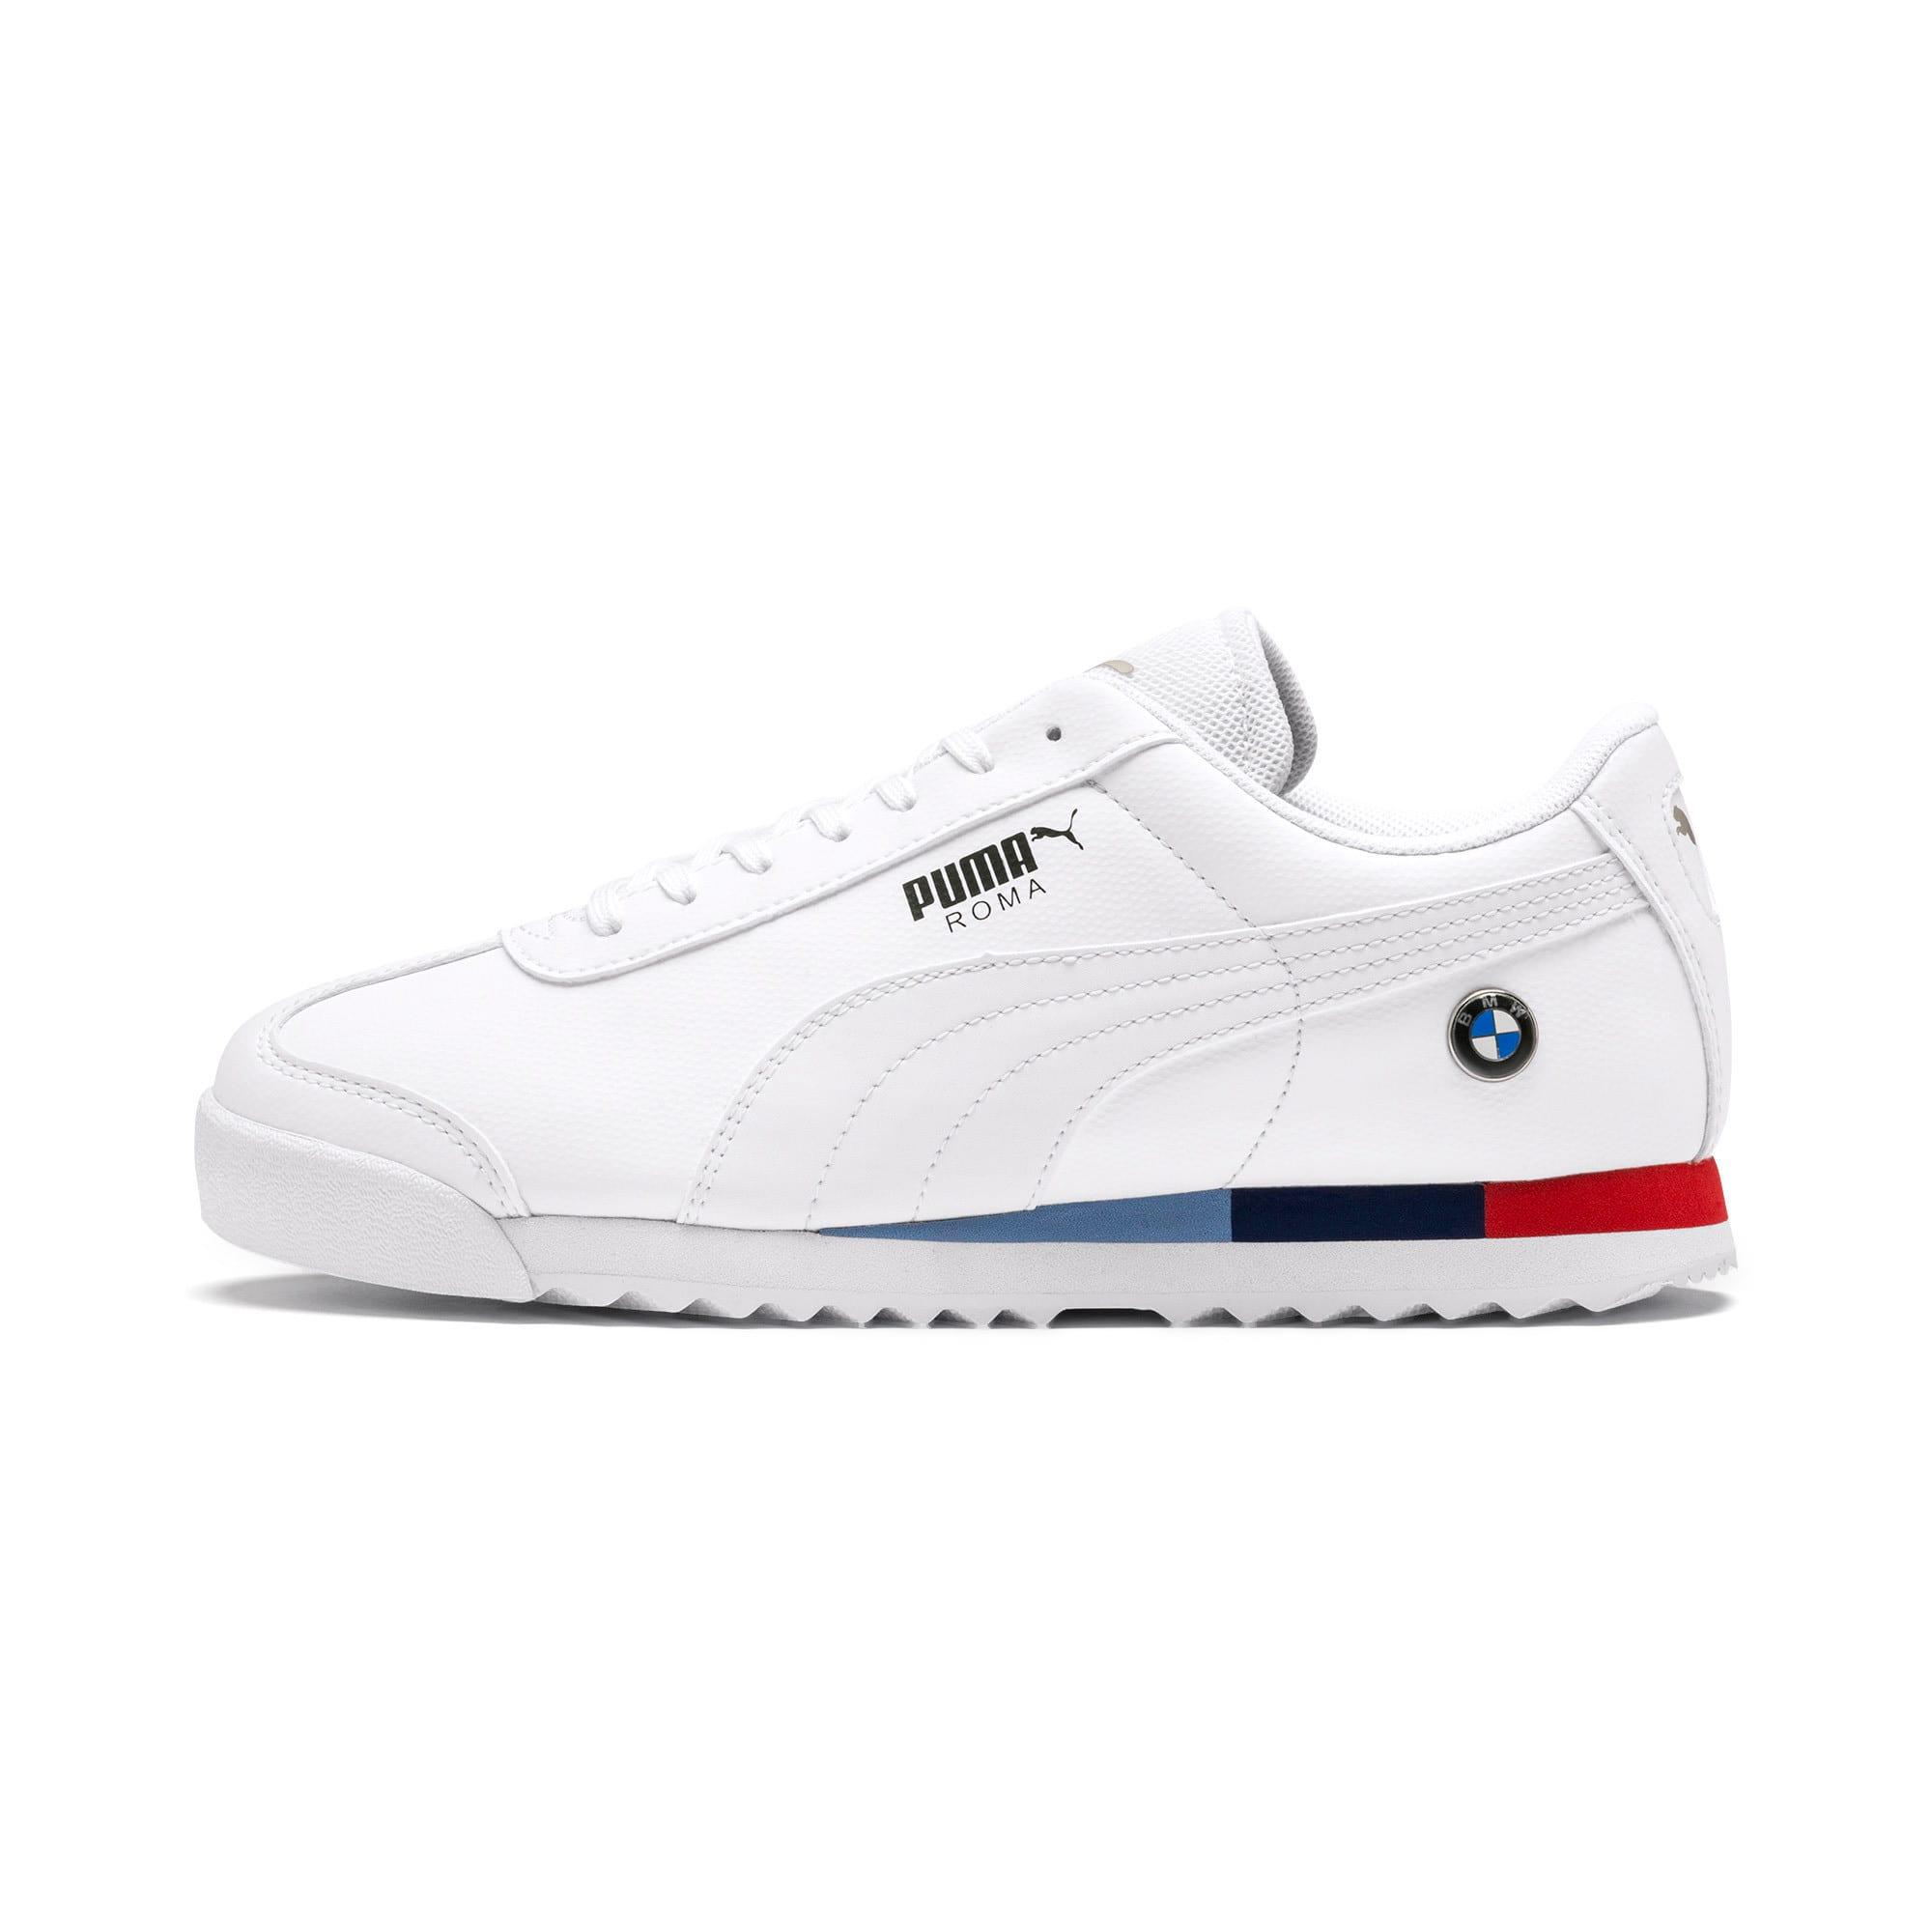 Thumbnail 1 of BMW M Motorsport Roma Sneakers JR, Puma White-Puma White, medium